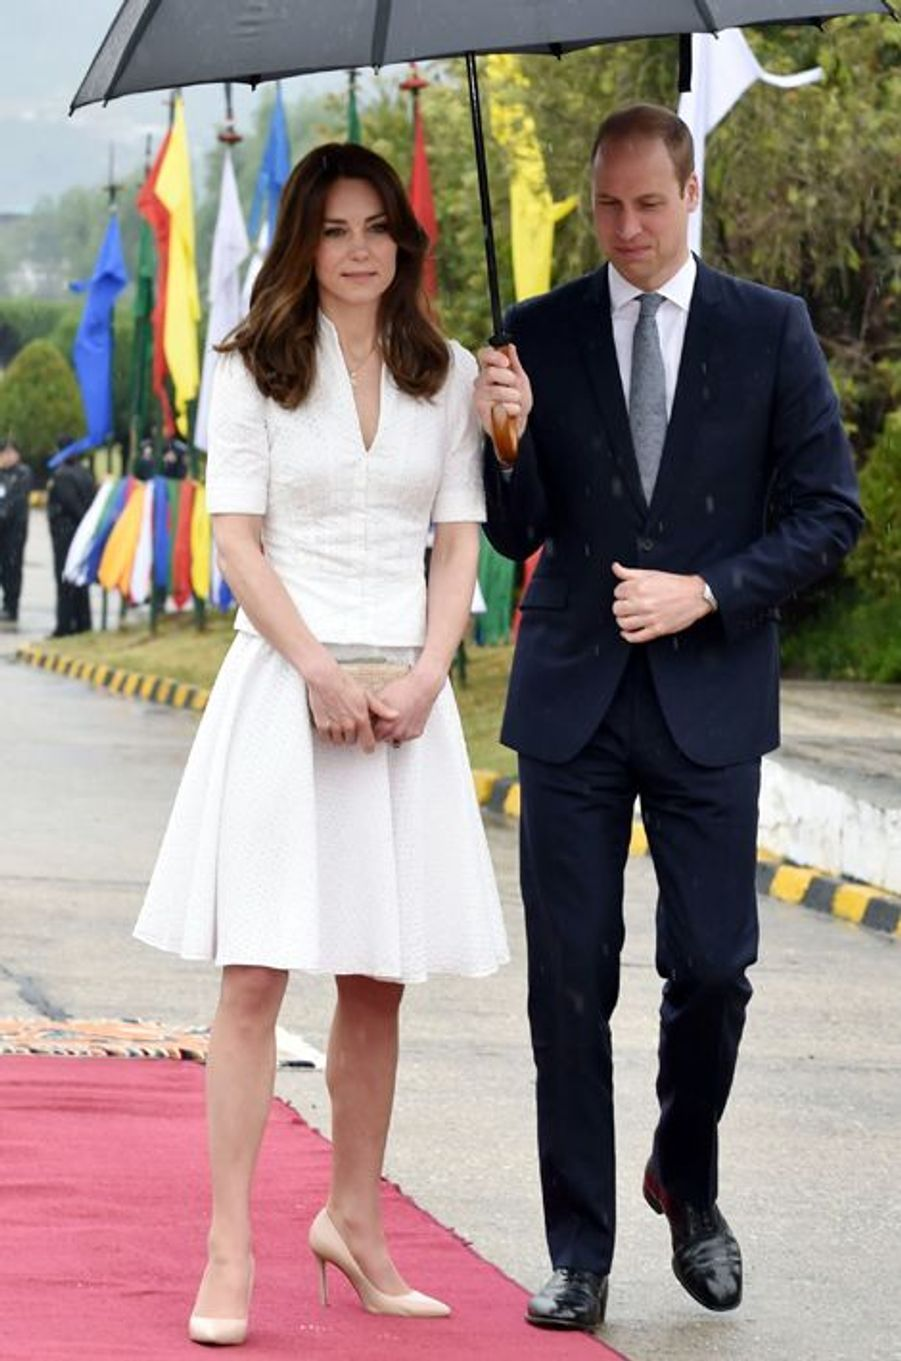 La duchesse Catherine de Cambridge en Alexander McQueen, le 16 avril 2016